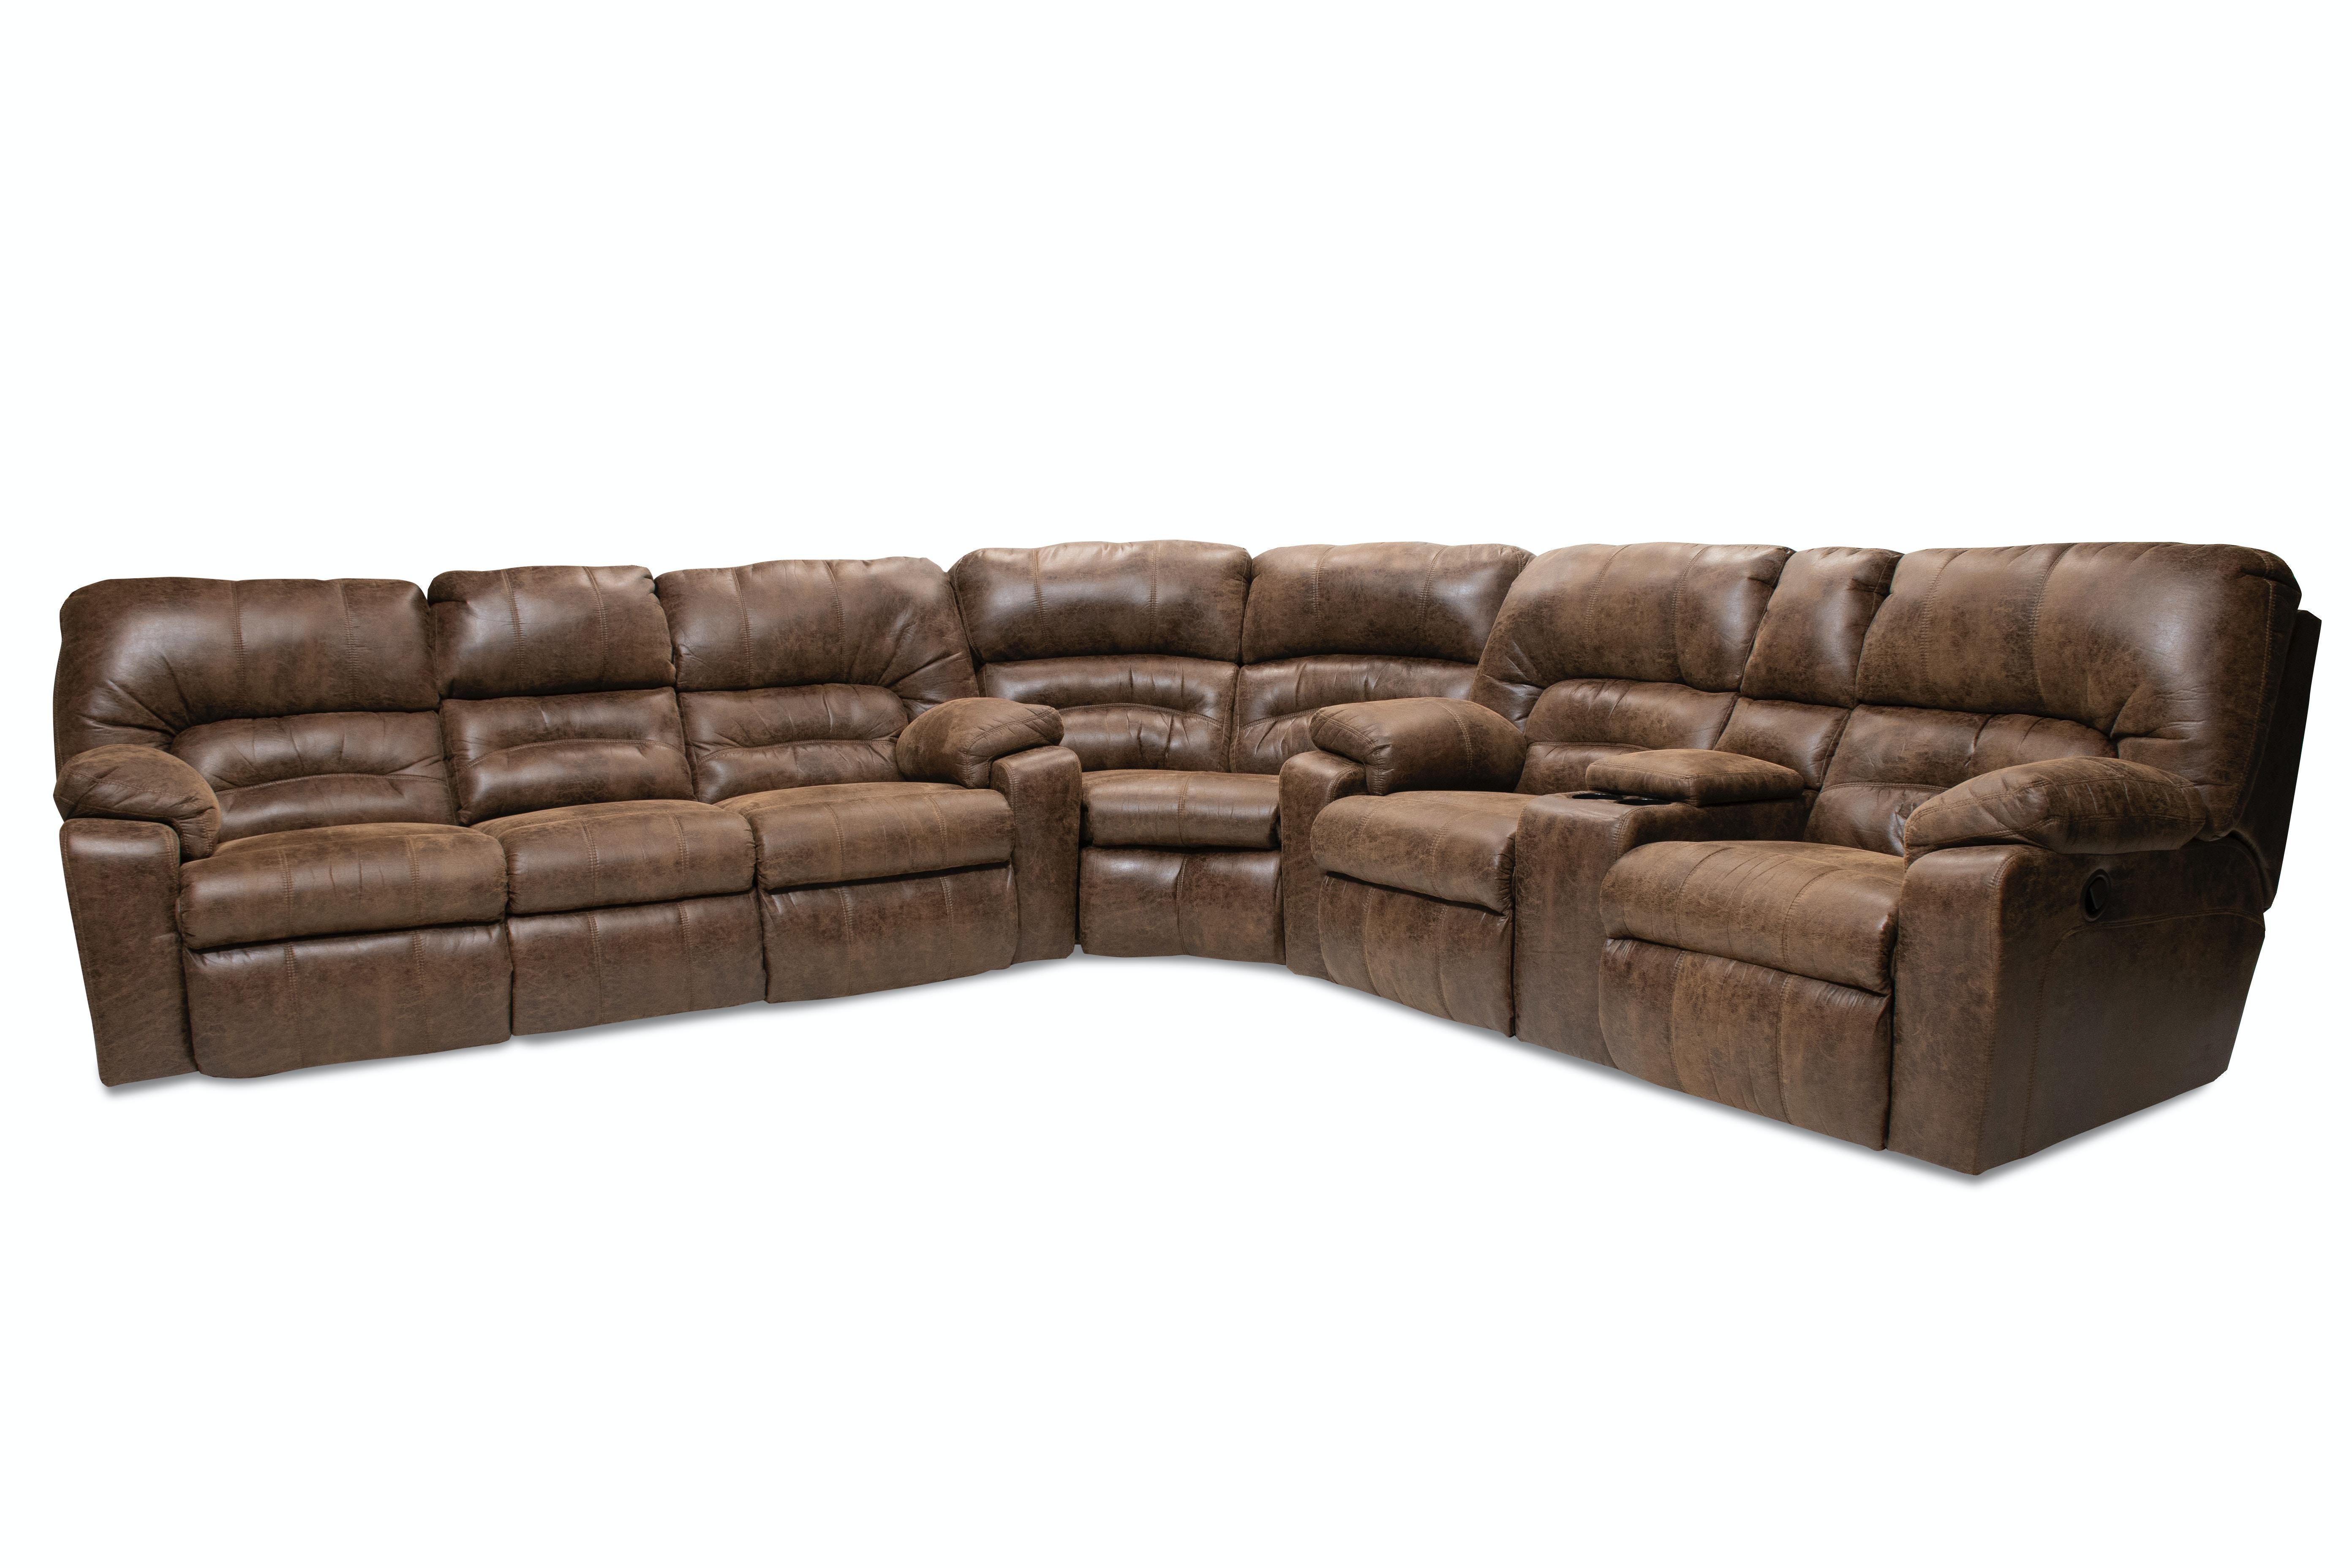 sectional sofas bob mills furniture rh bobmillsfurniture com sectional sofas okc ok